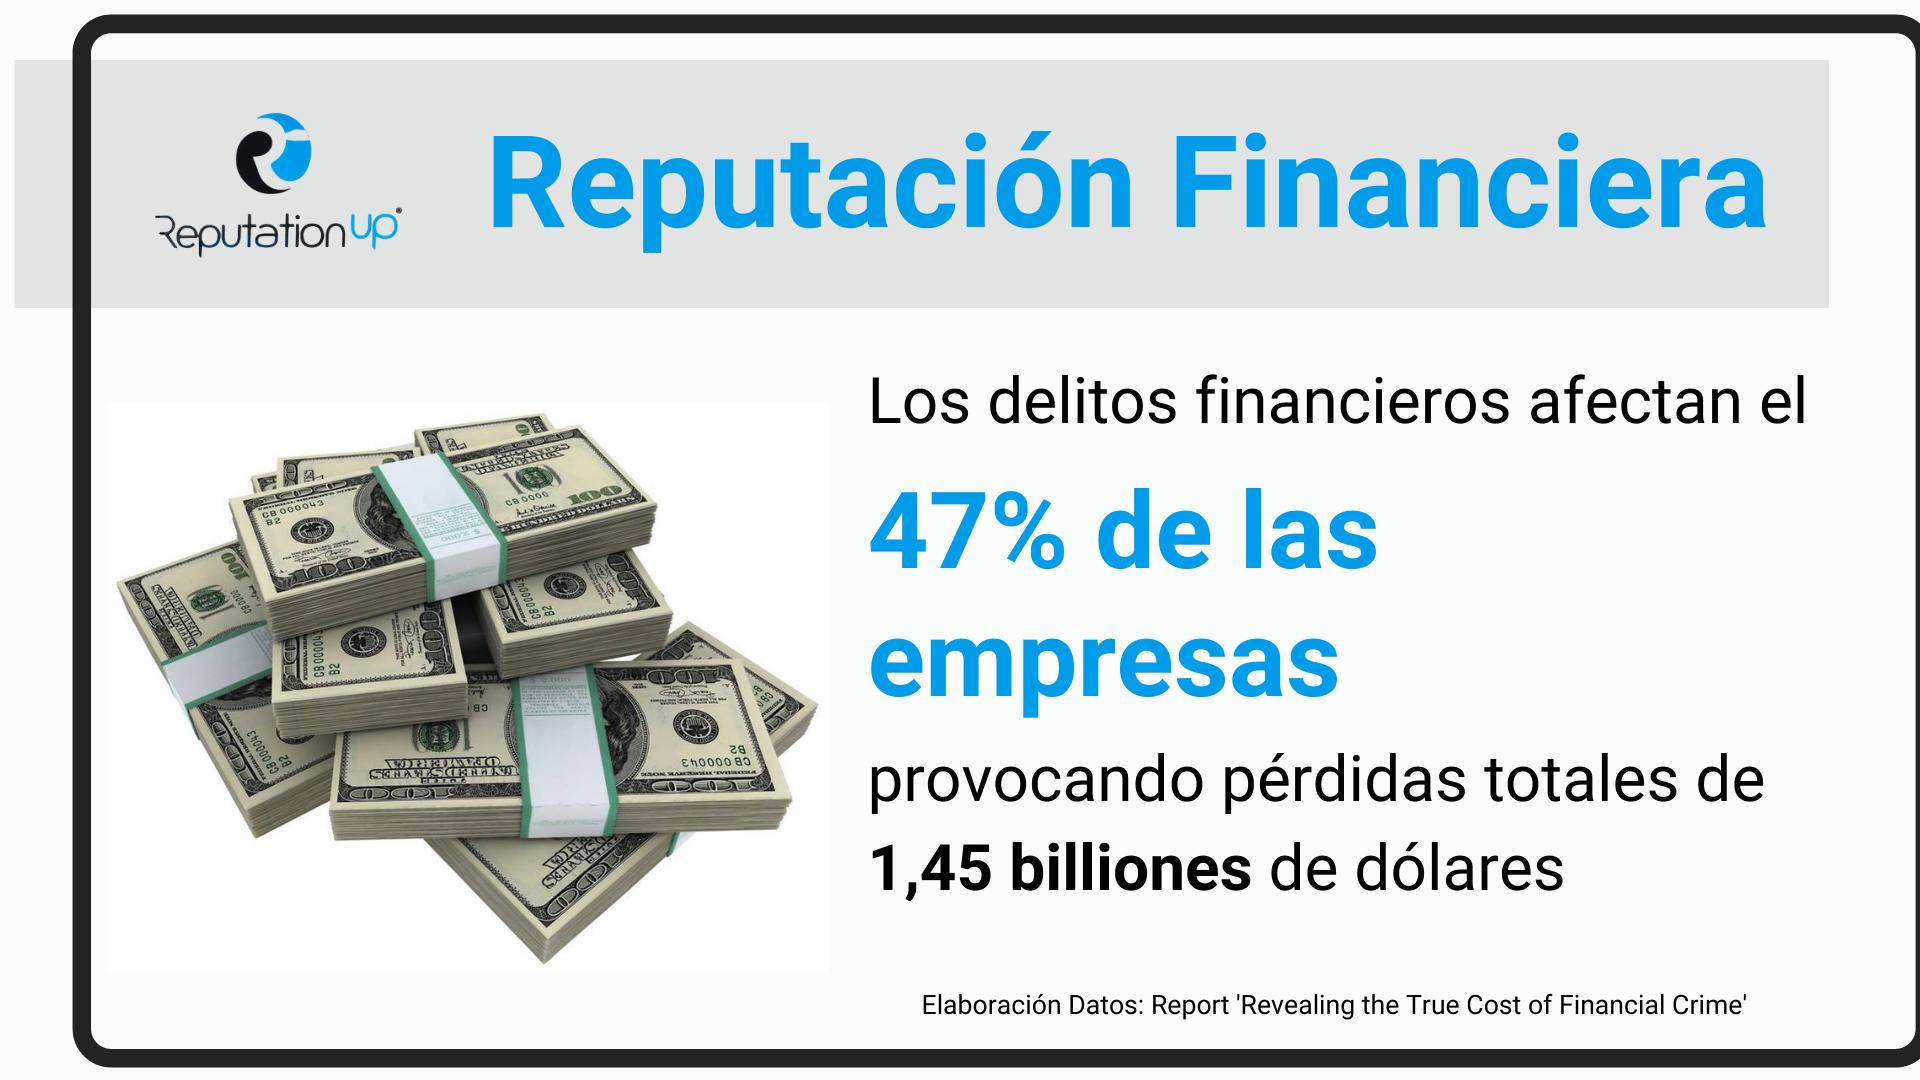 Fotografia Reputación financiera. ReputationUP Protege Con Éxito La